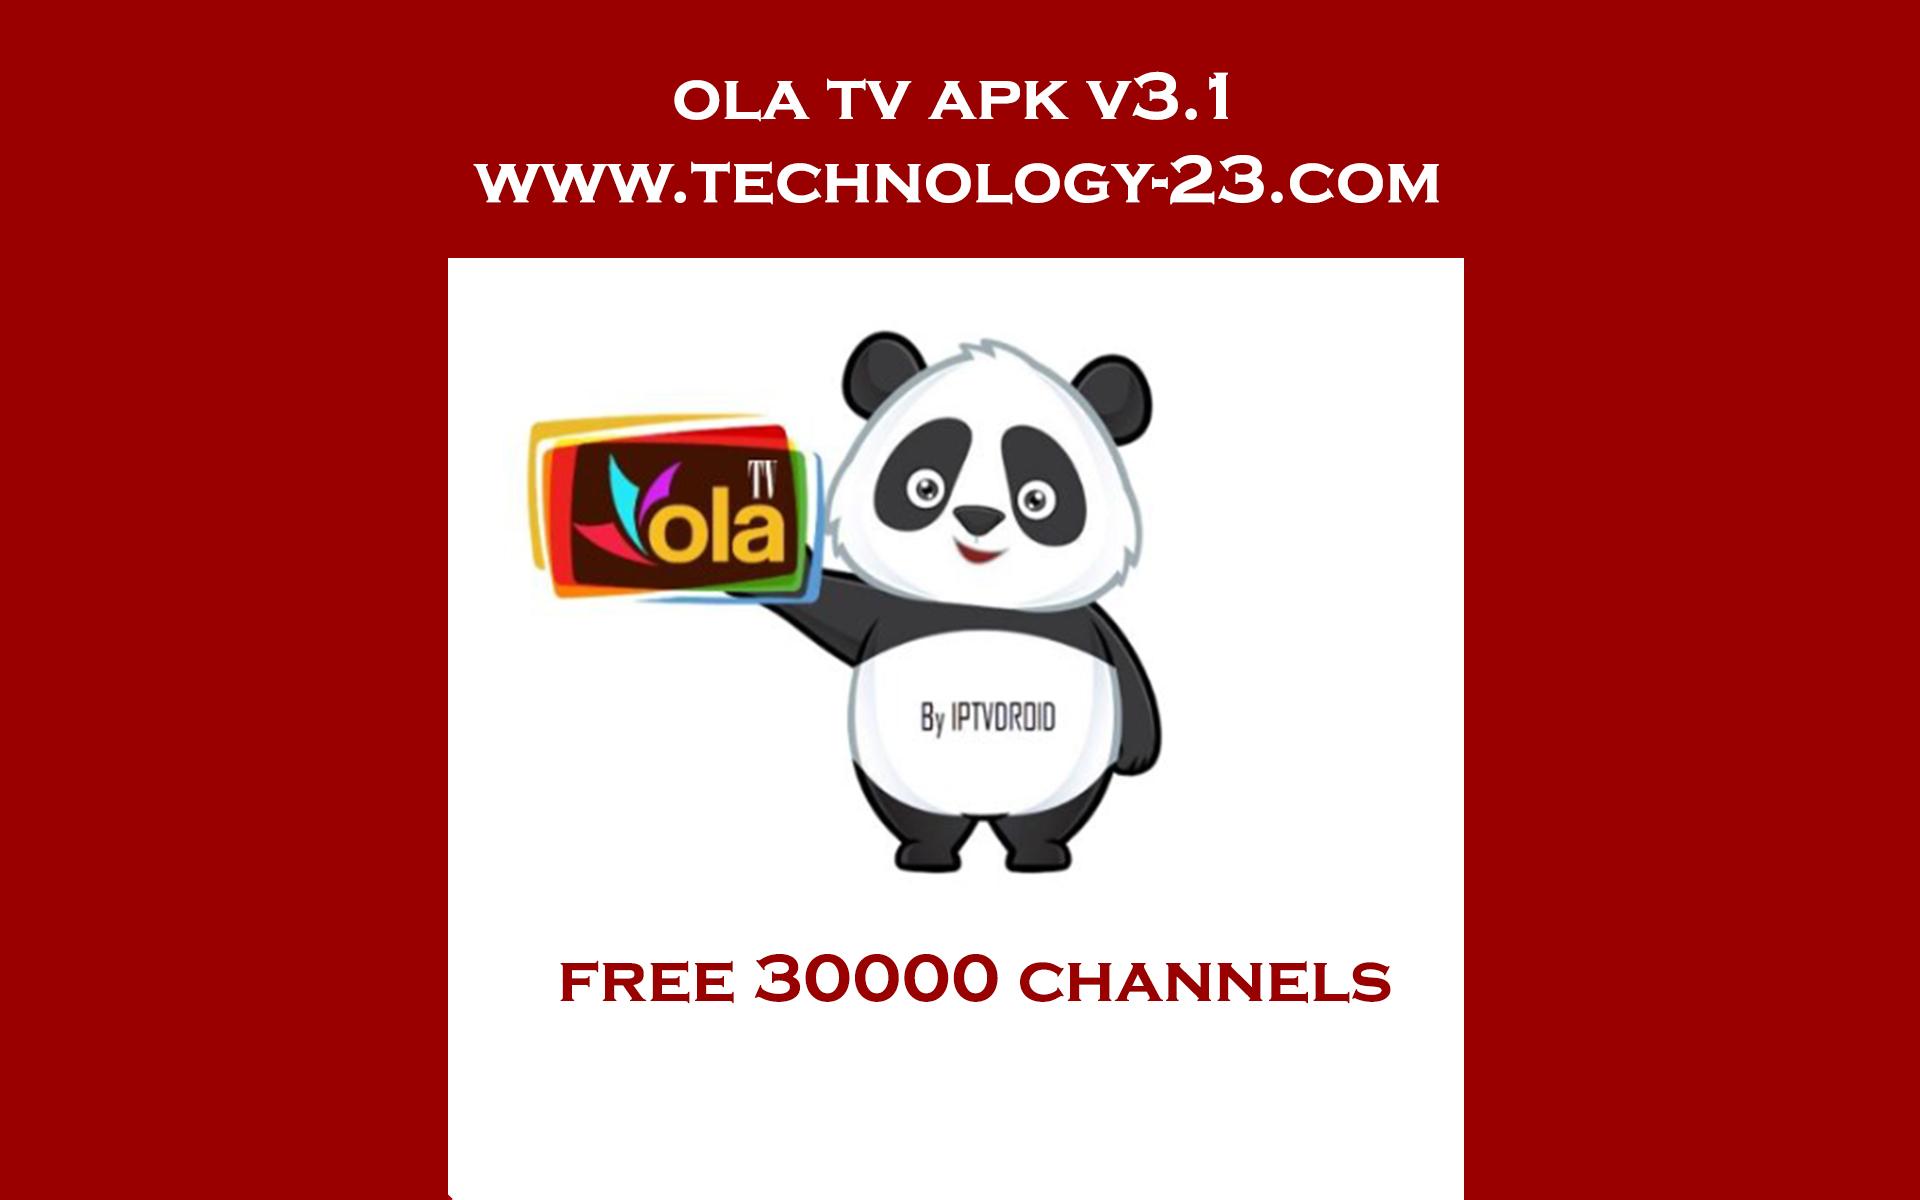 Ola tv 3 0 apk for android | Ola Tv  2019-04-17